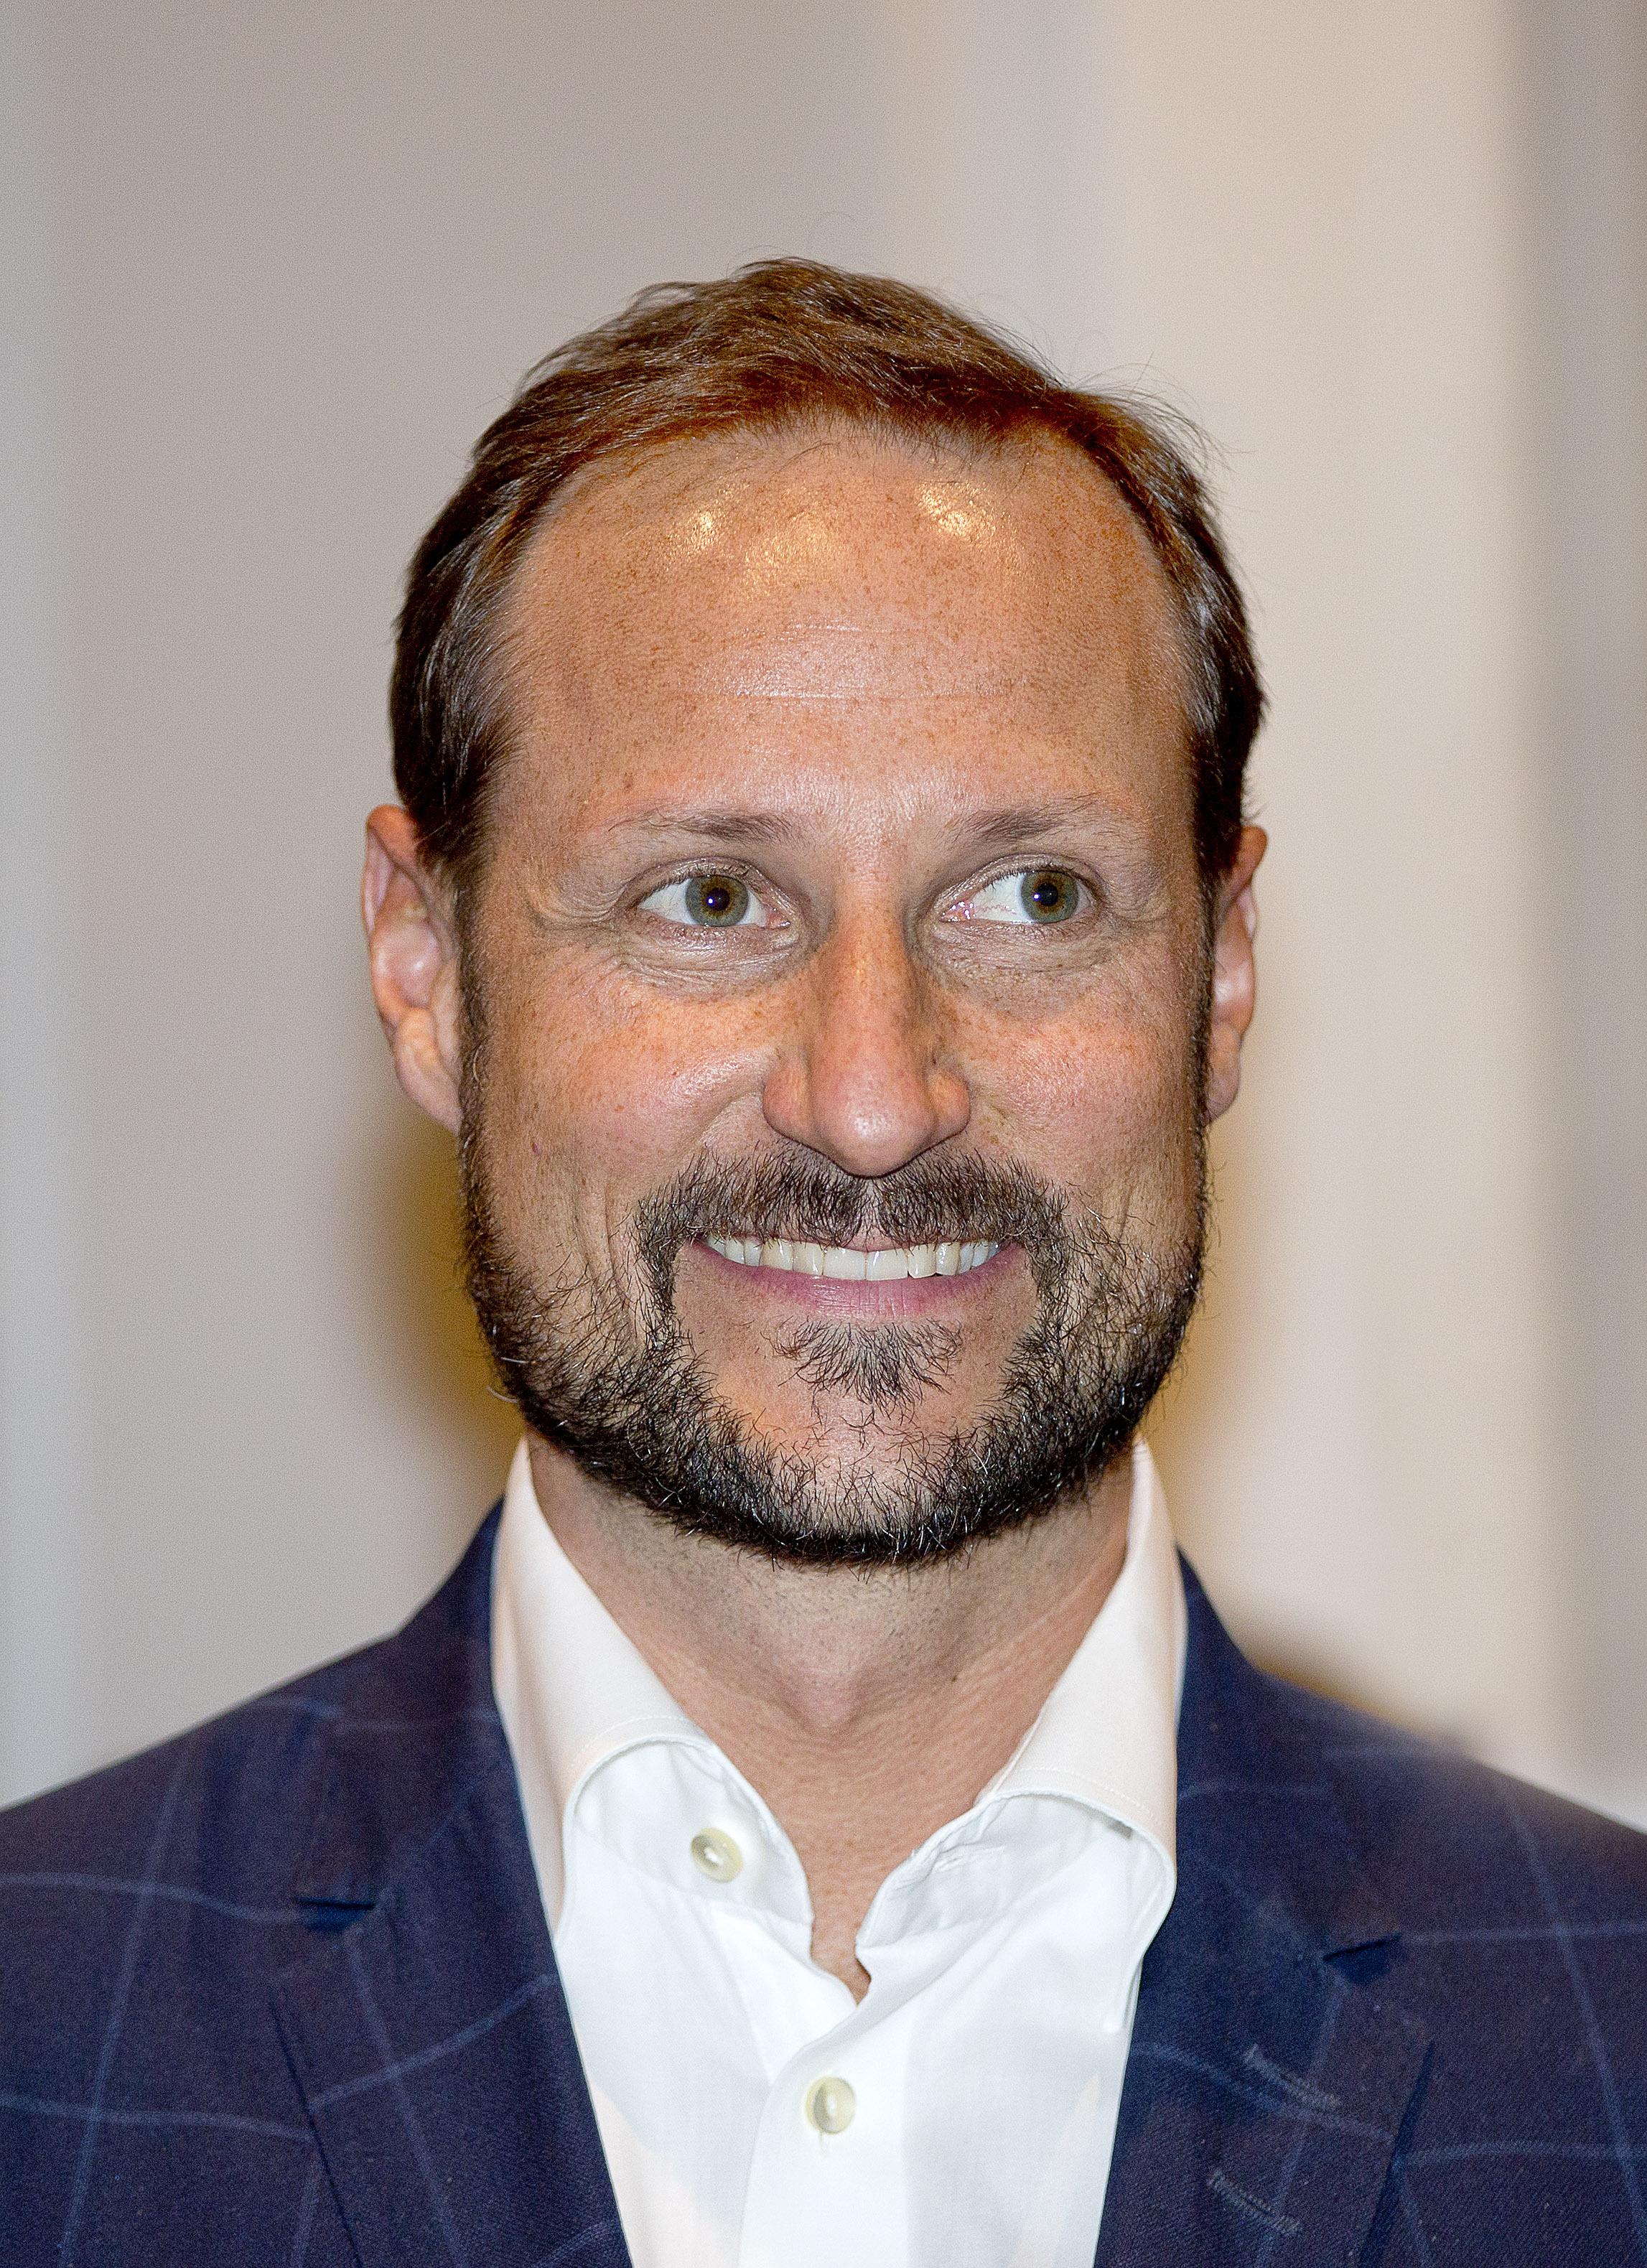 Kronprinz Haakon